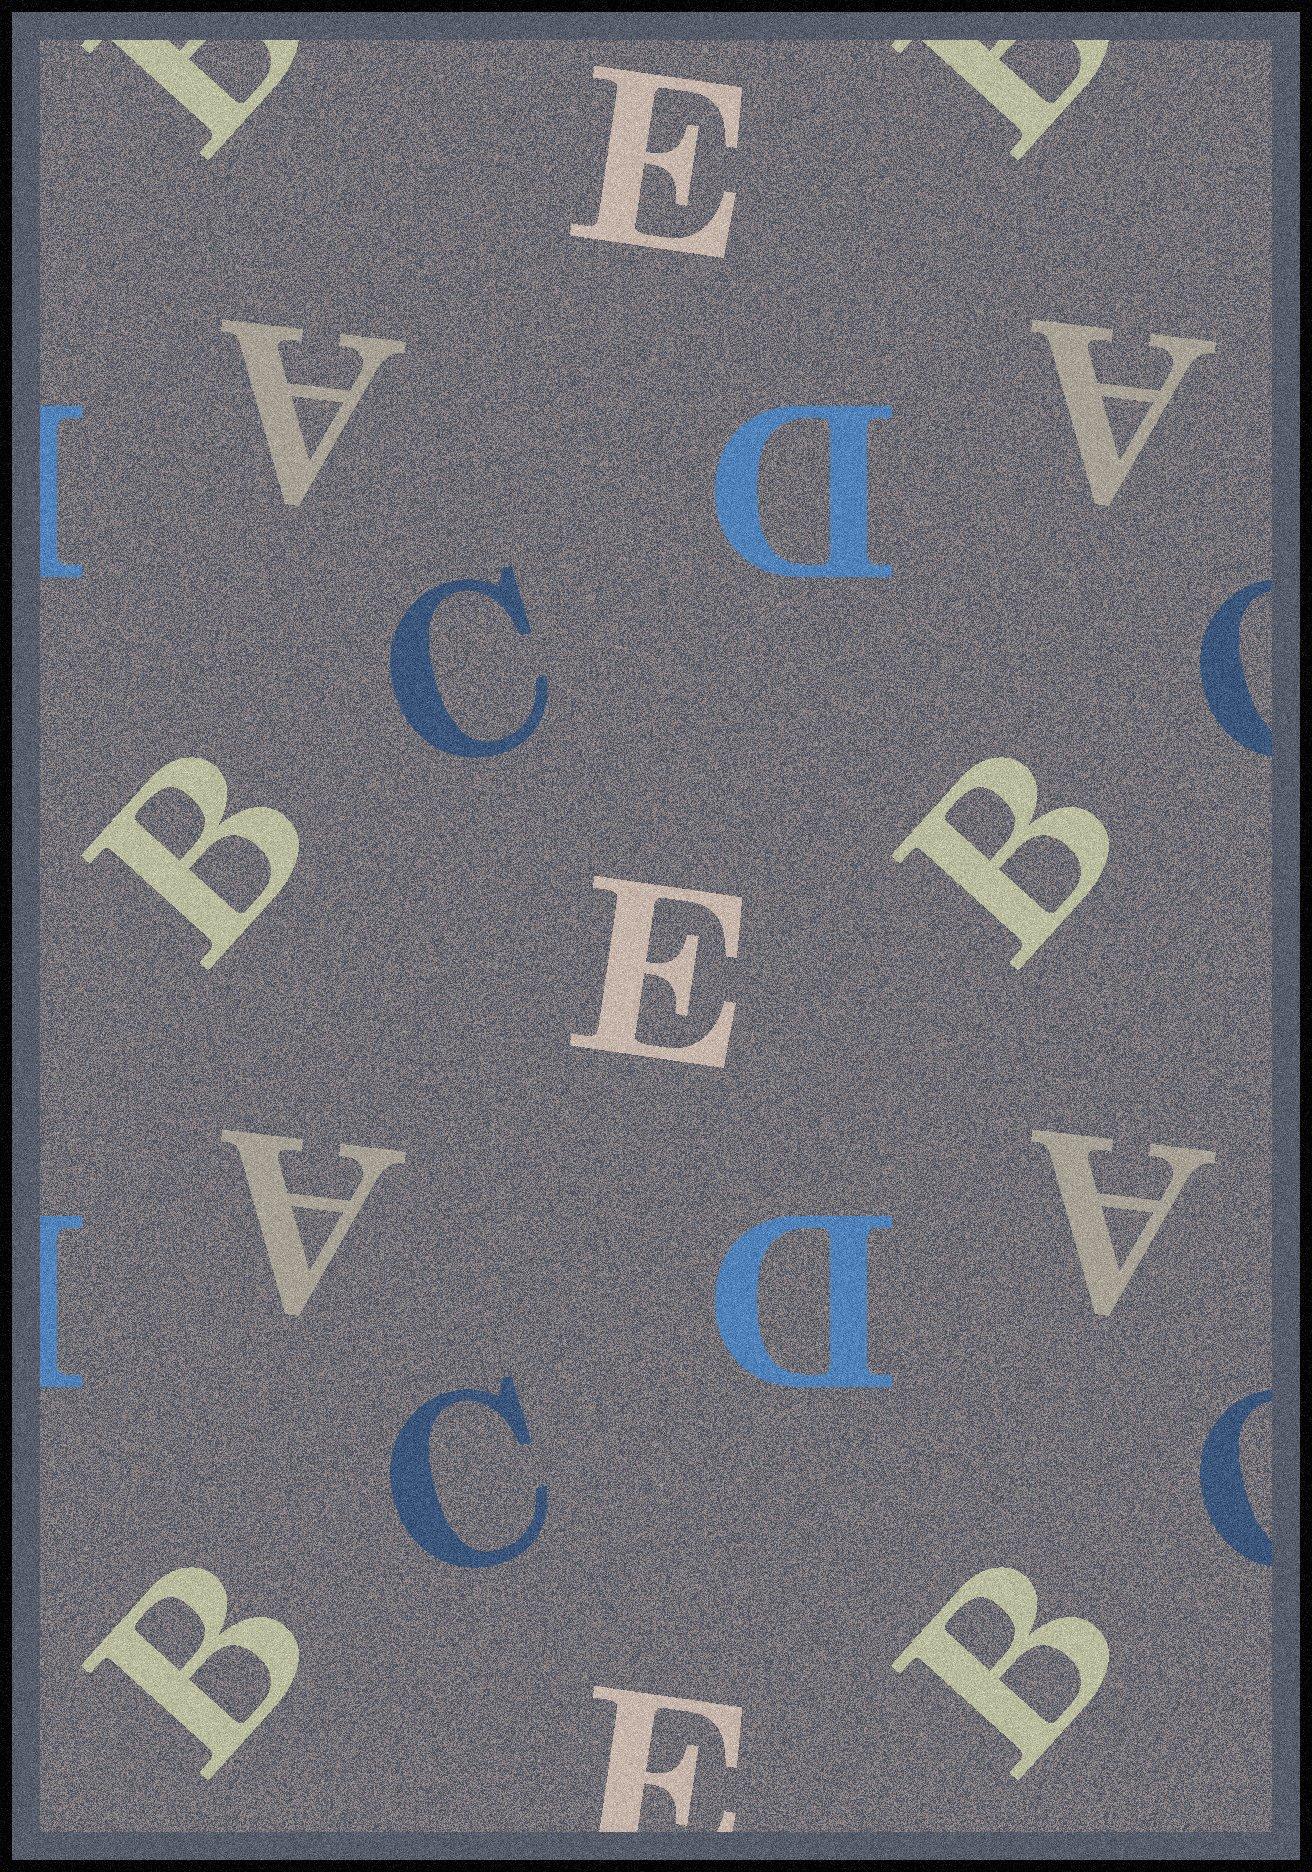 Joy Carpets Playful Patterns Children's Love Letters Area Rug, Seaside, 7'8'' x 10'9''